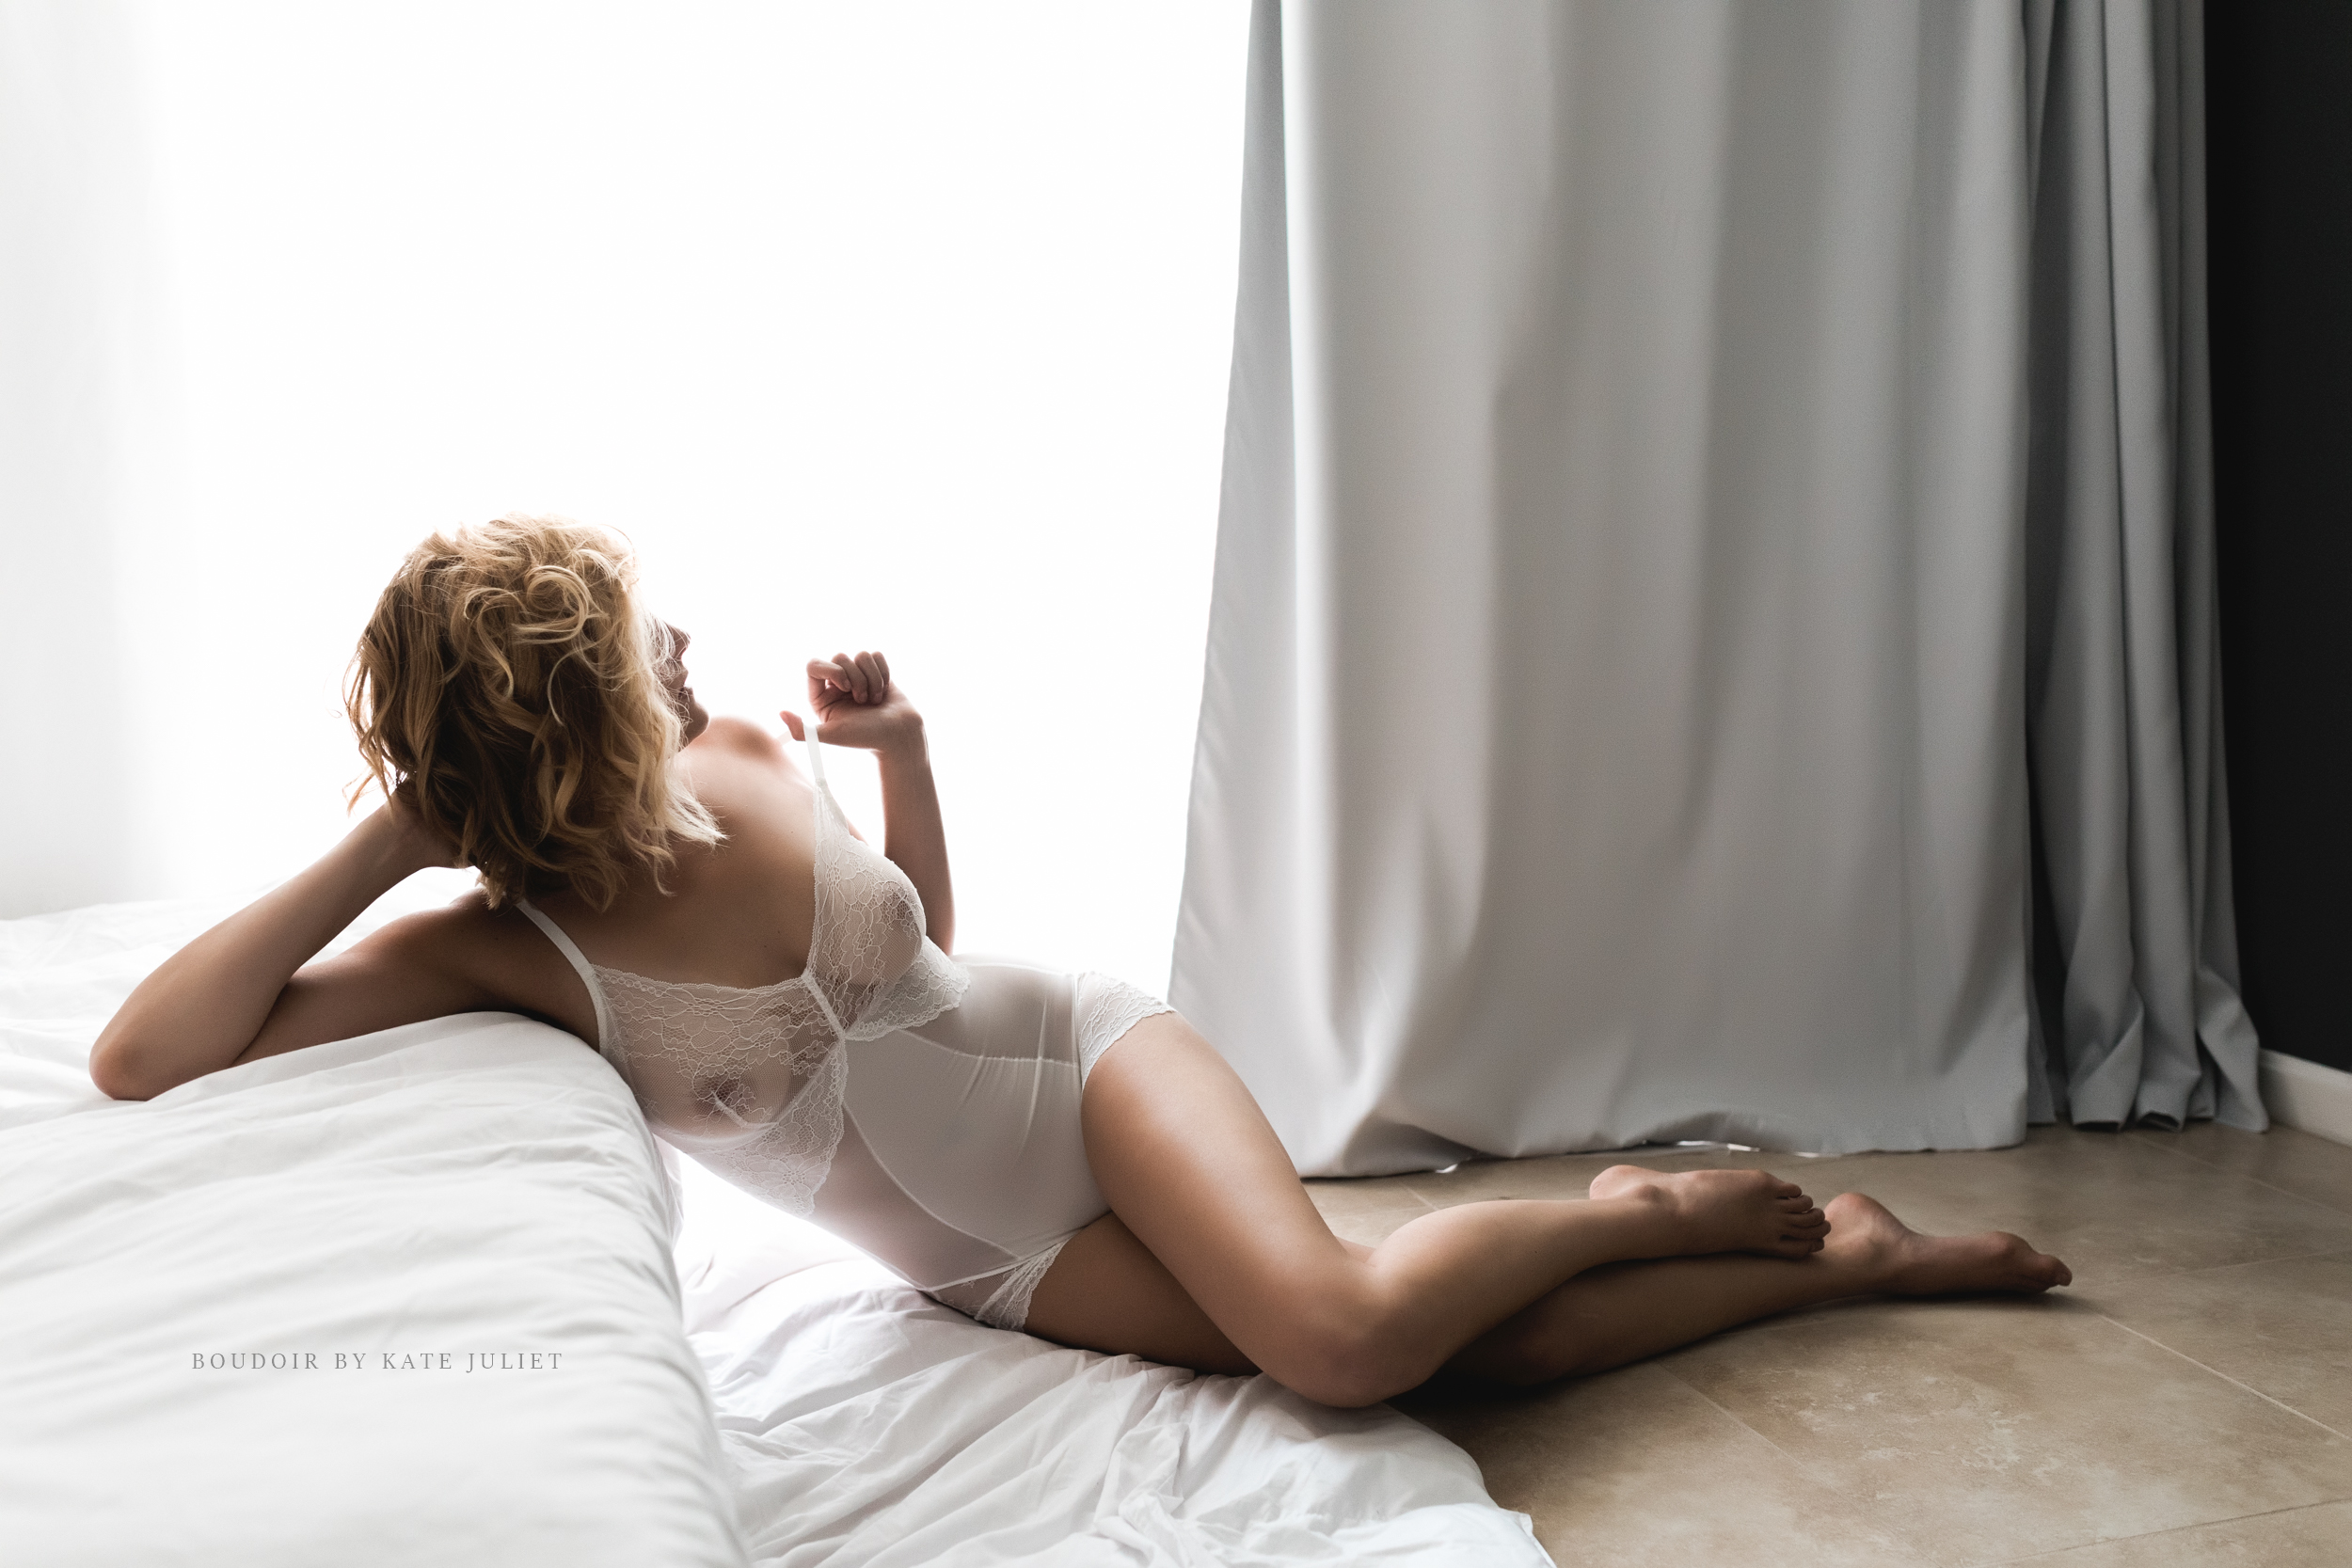 kate juliet photography - boudoir - washington dc -036487.jpg